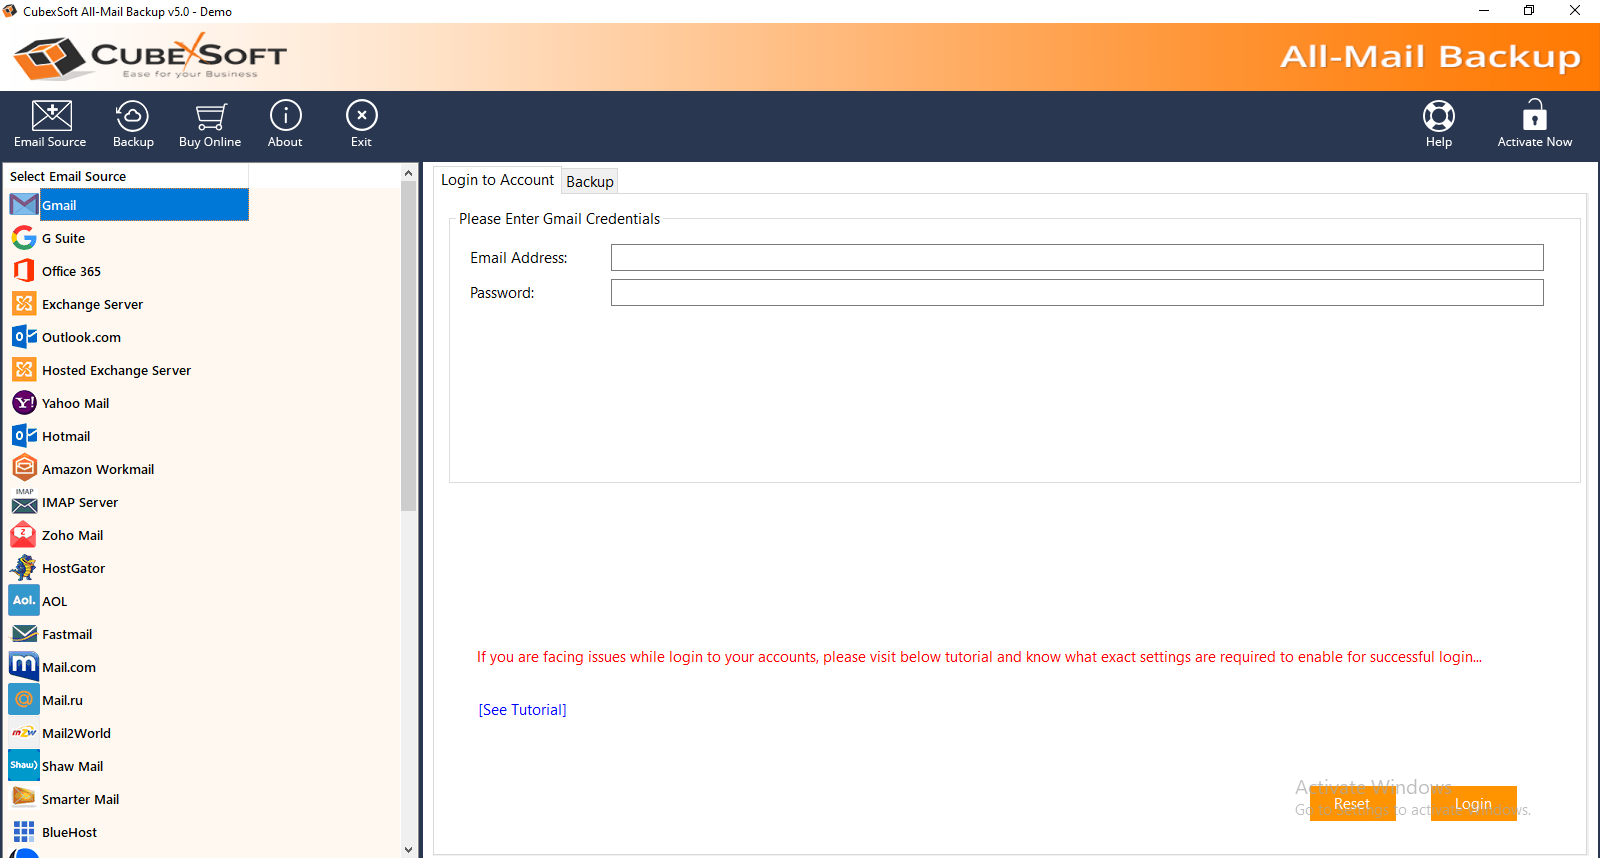 Bluehost Backup full screenshot